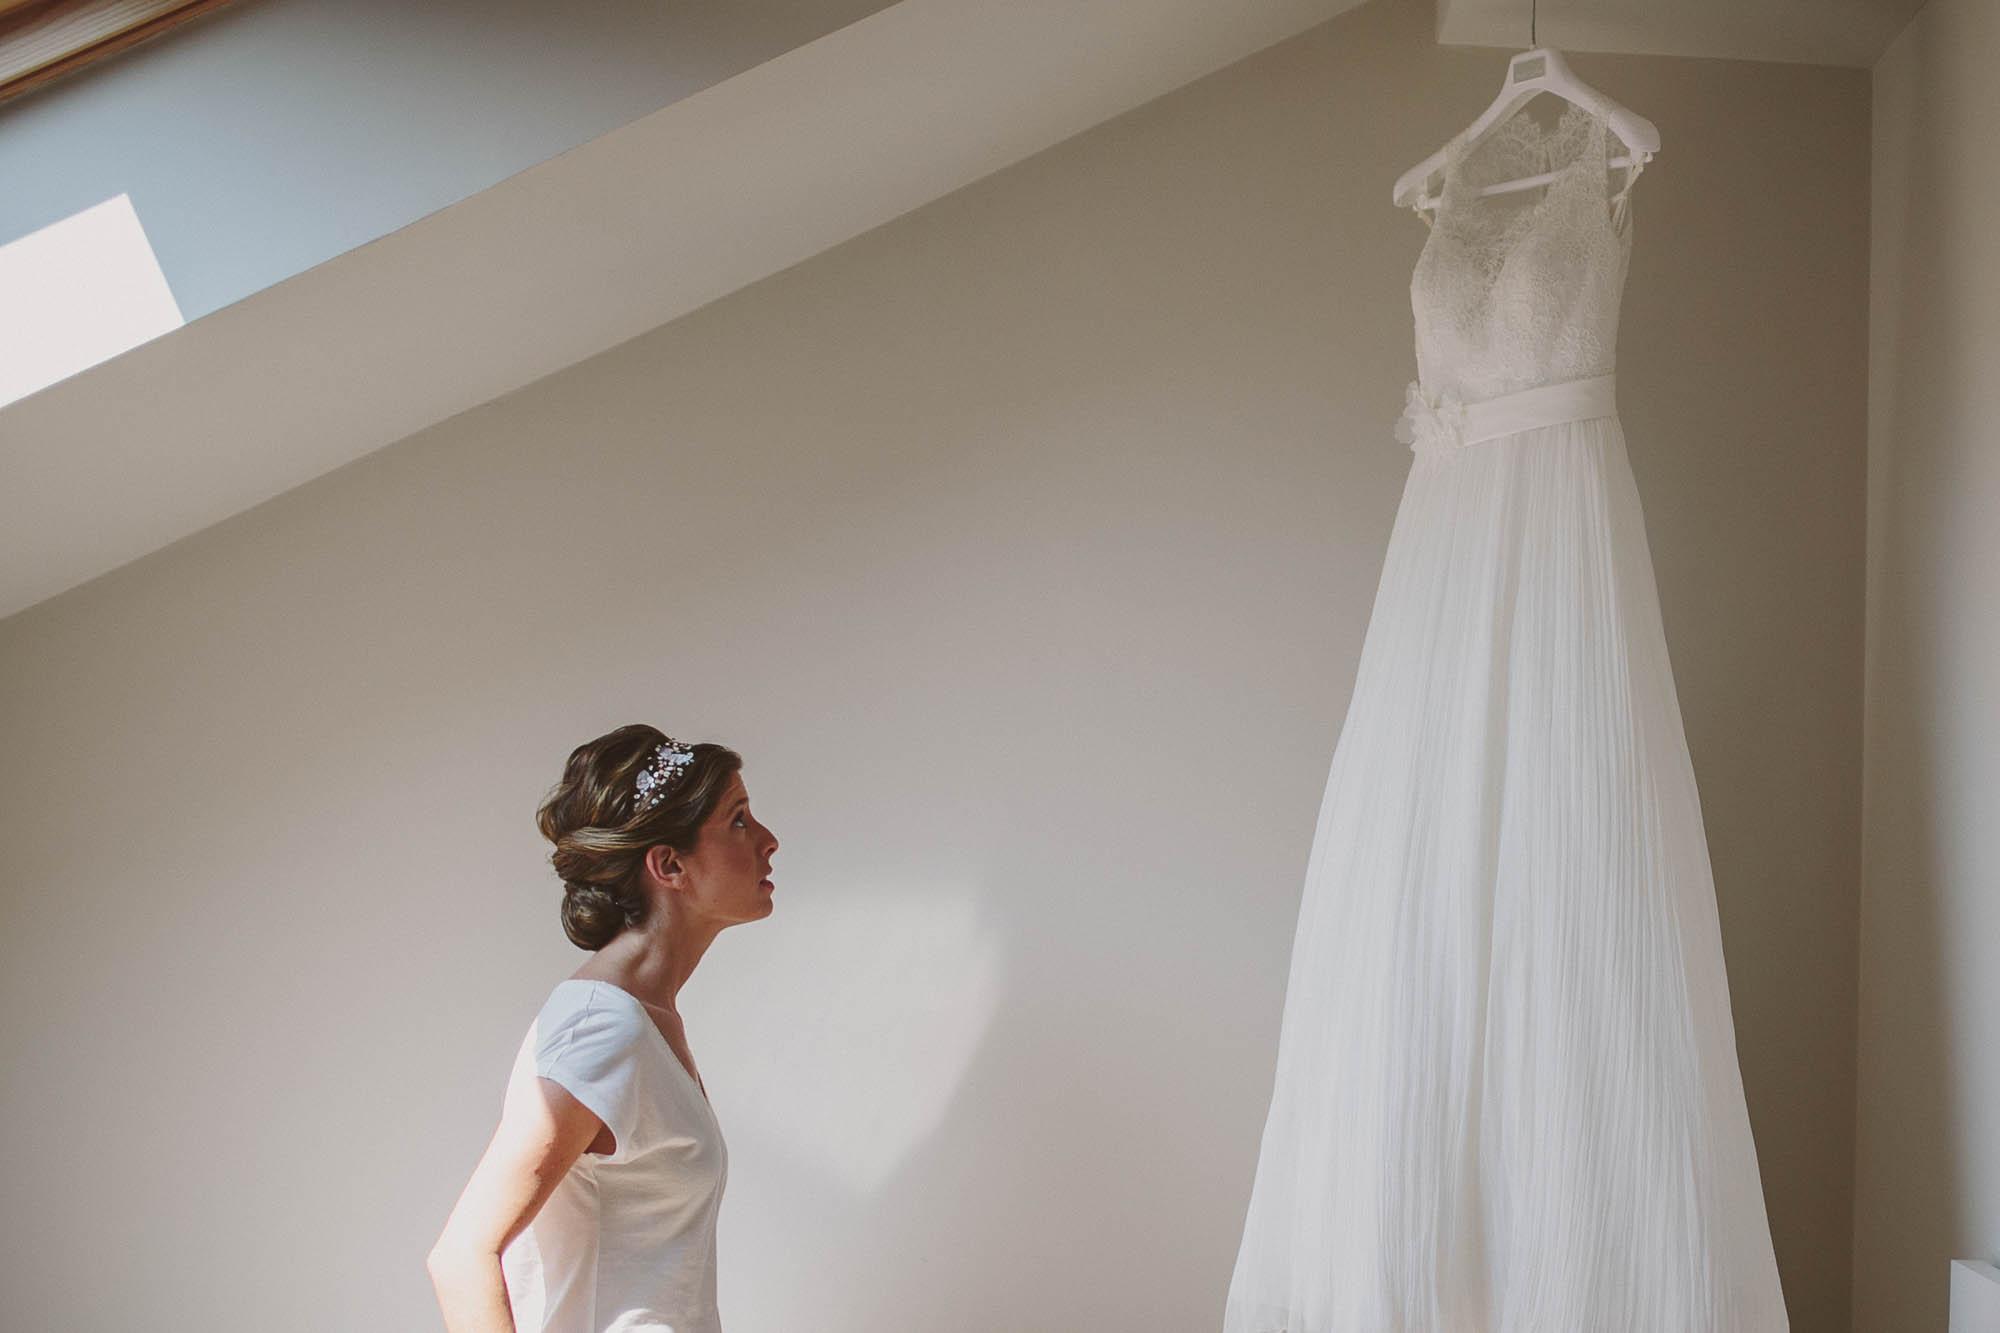 La novia casi lista mira su vestido para la boda